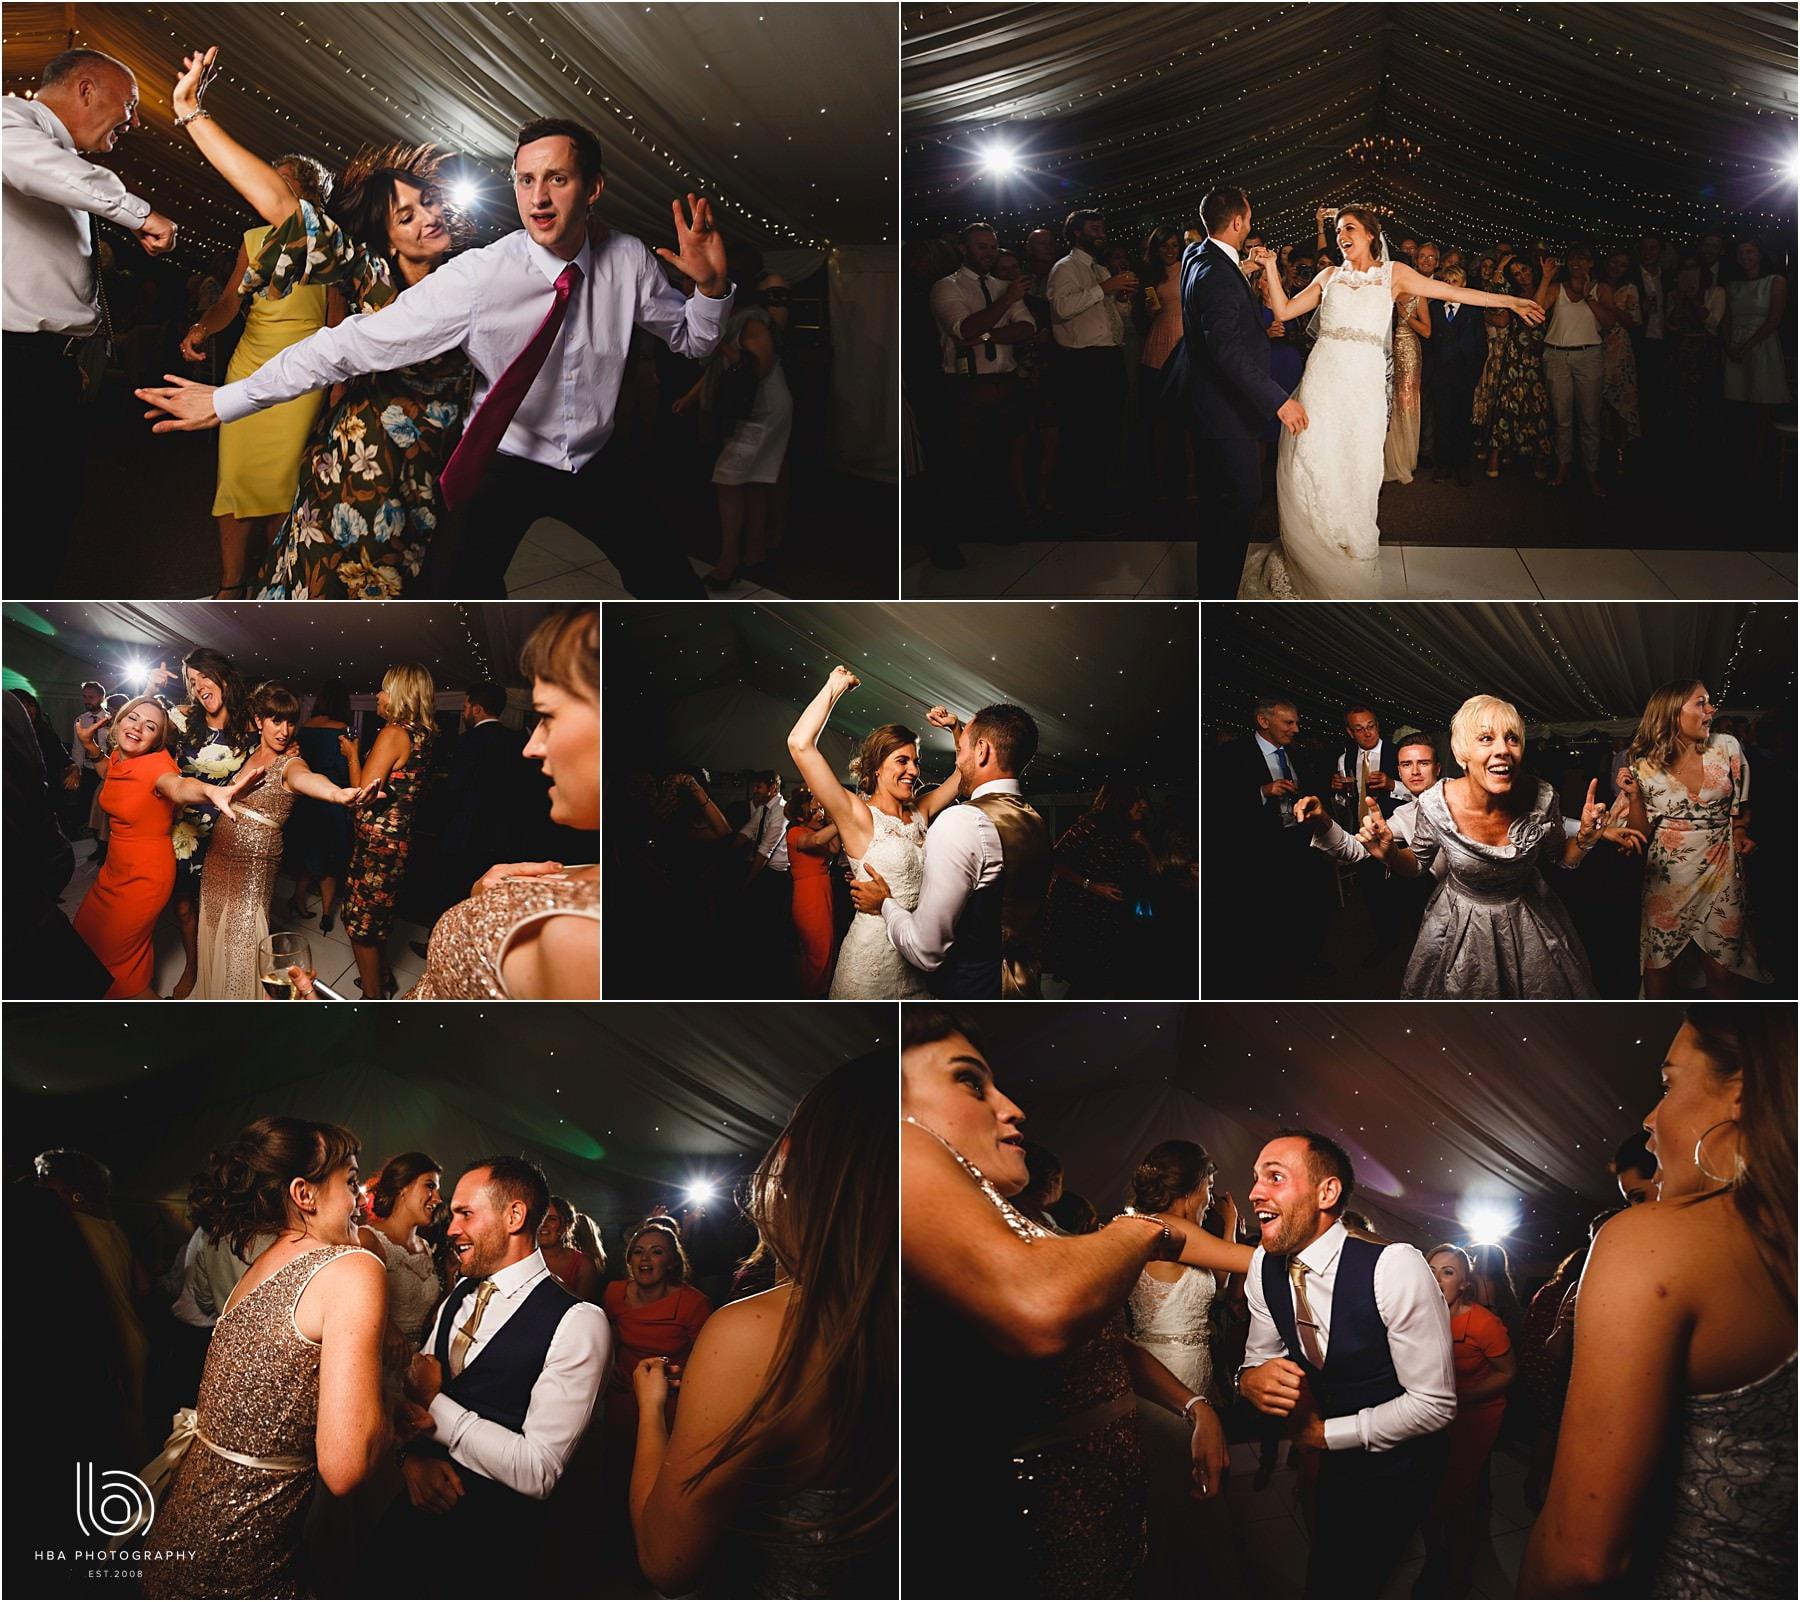 the evening wedding reception